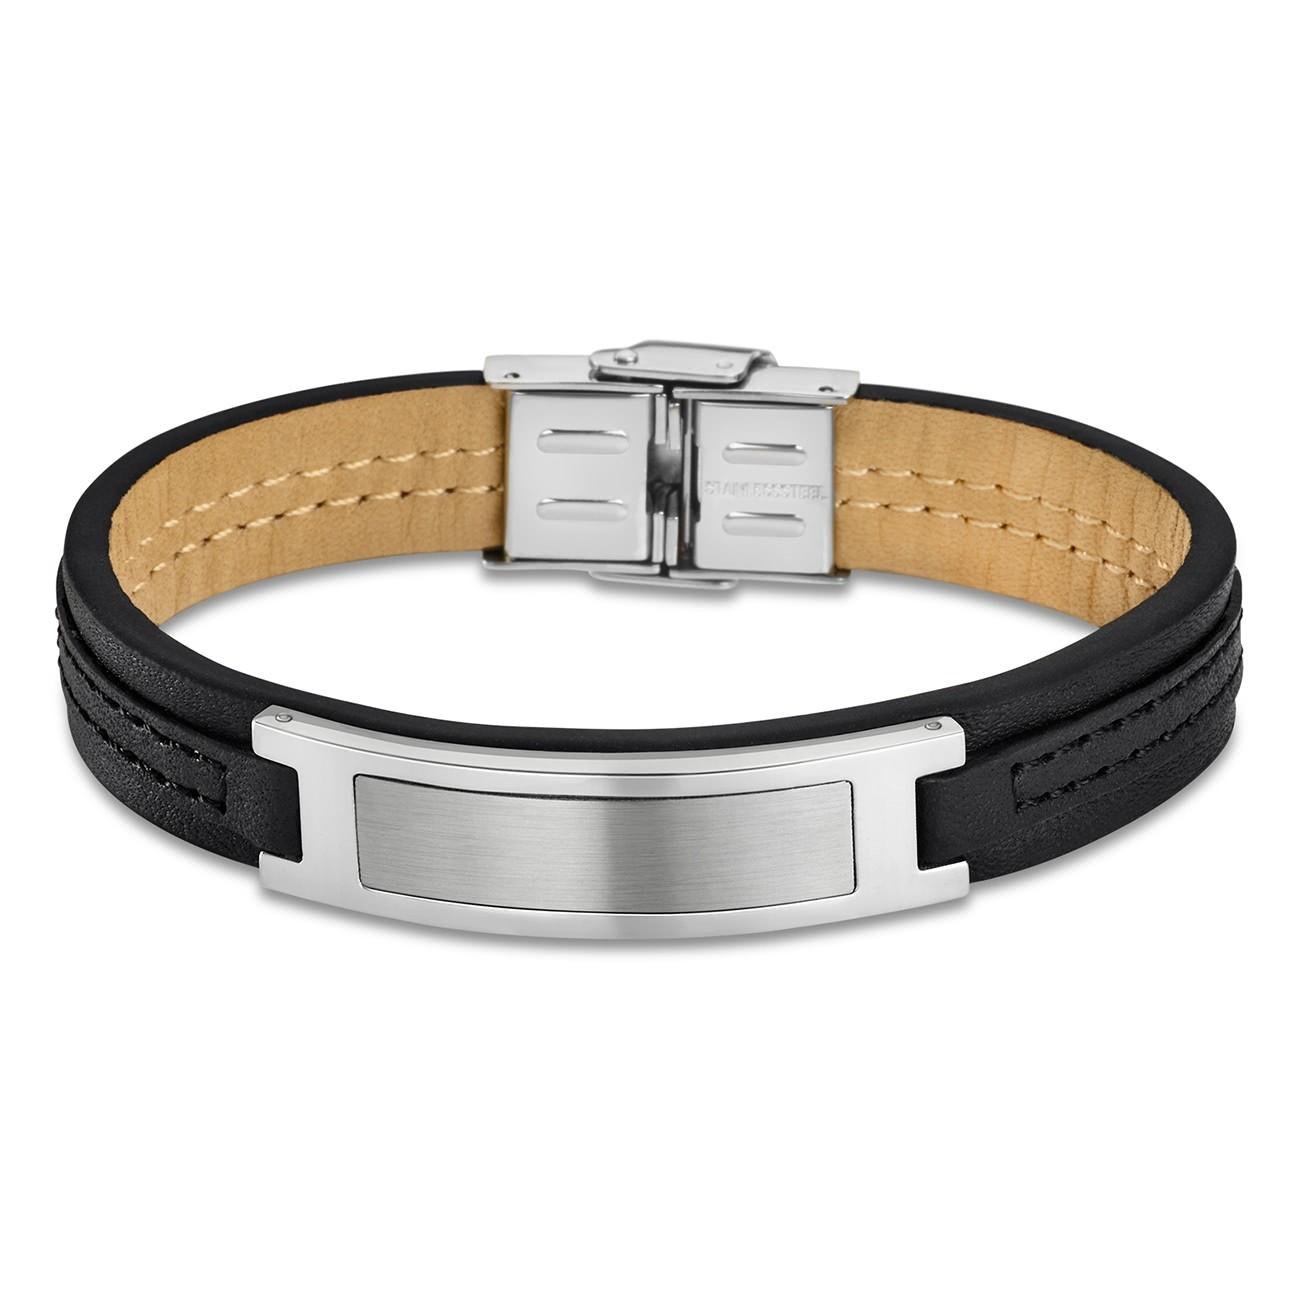 LOTUS Style Armband Herren Leder silber schwarz LS1808-2/2 Urban JLS1808-2-2